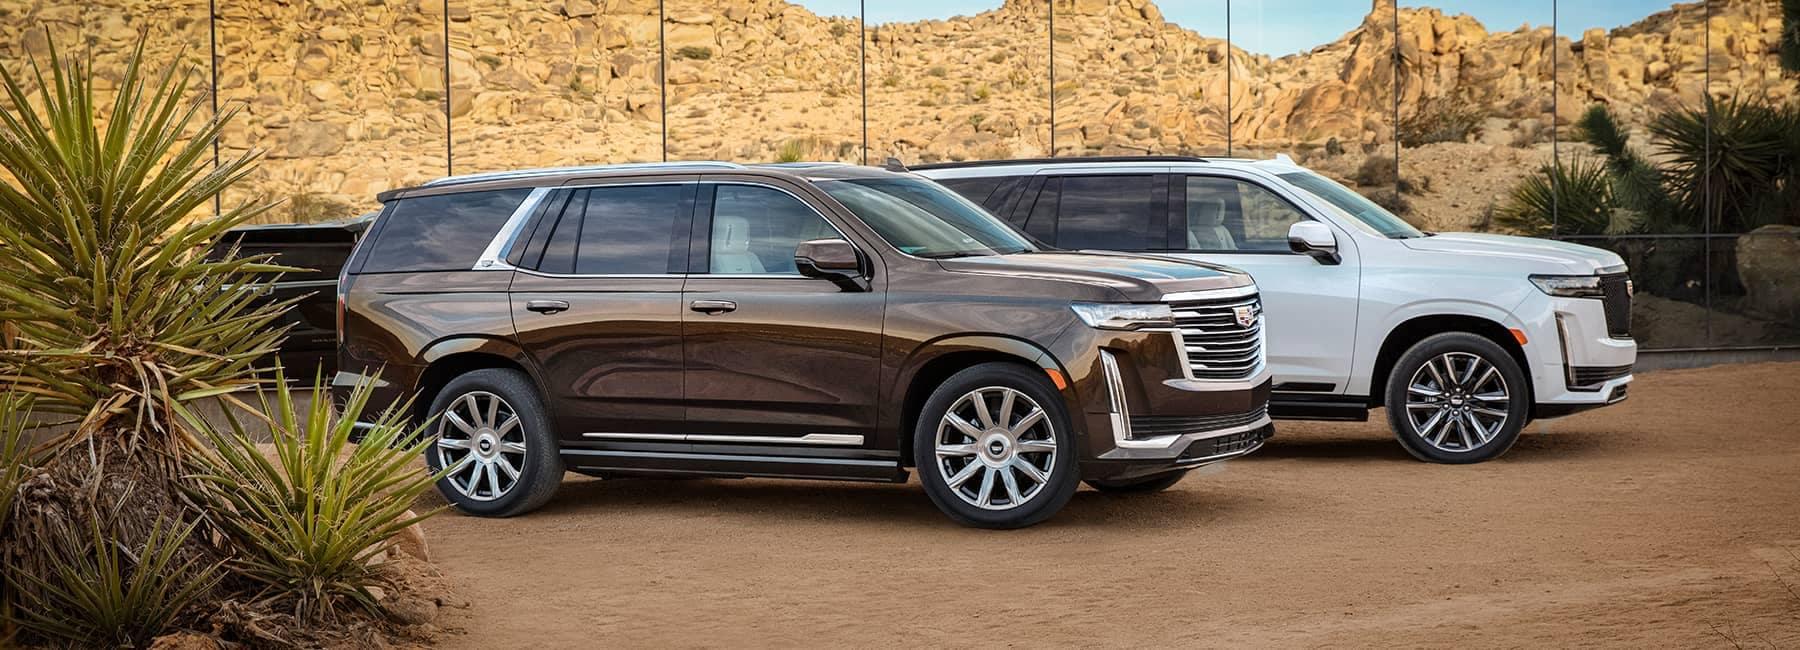 2021 Cadillac Escalade parked in a row